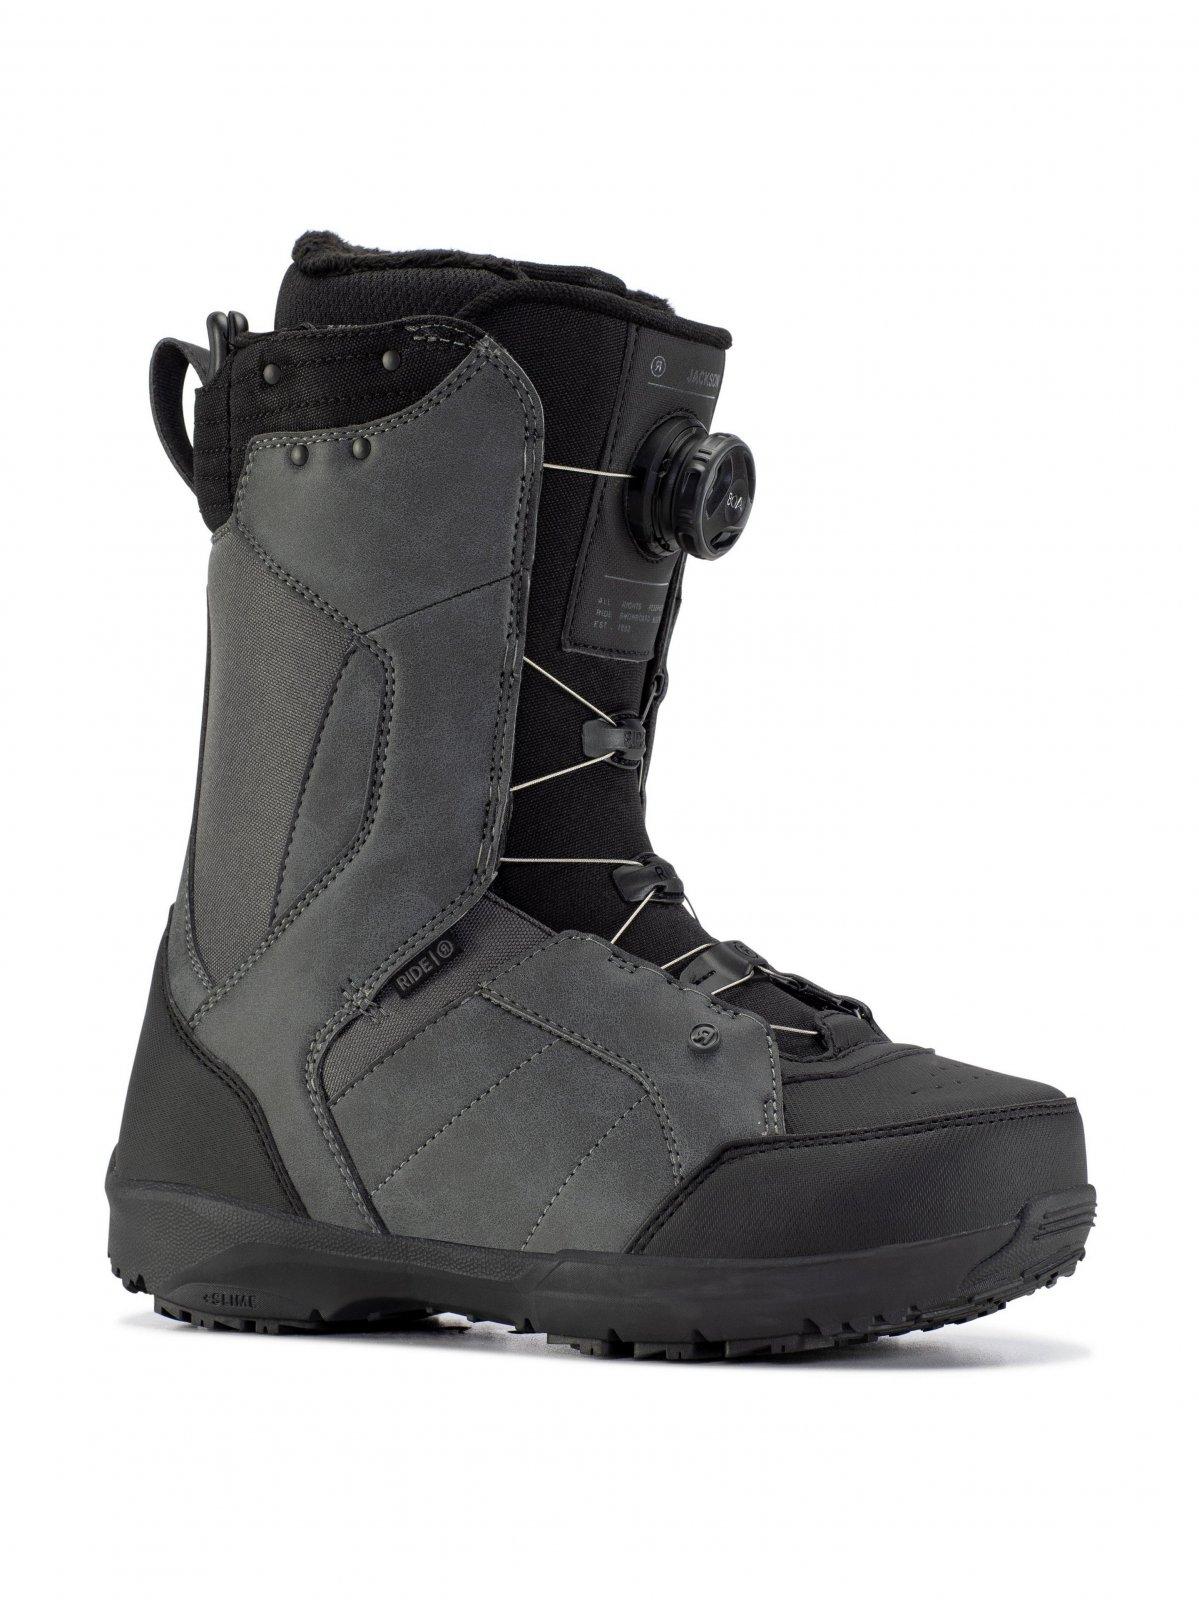 2021 Ride Jackson Men's Snowboard Boots